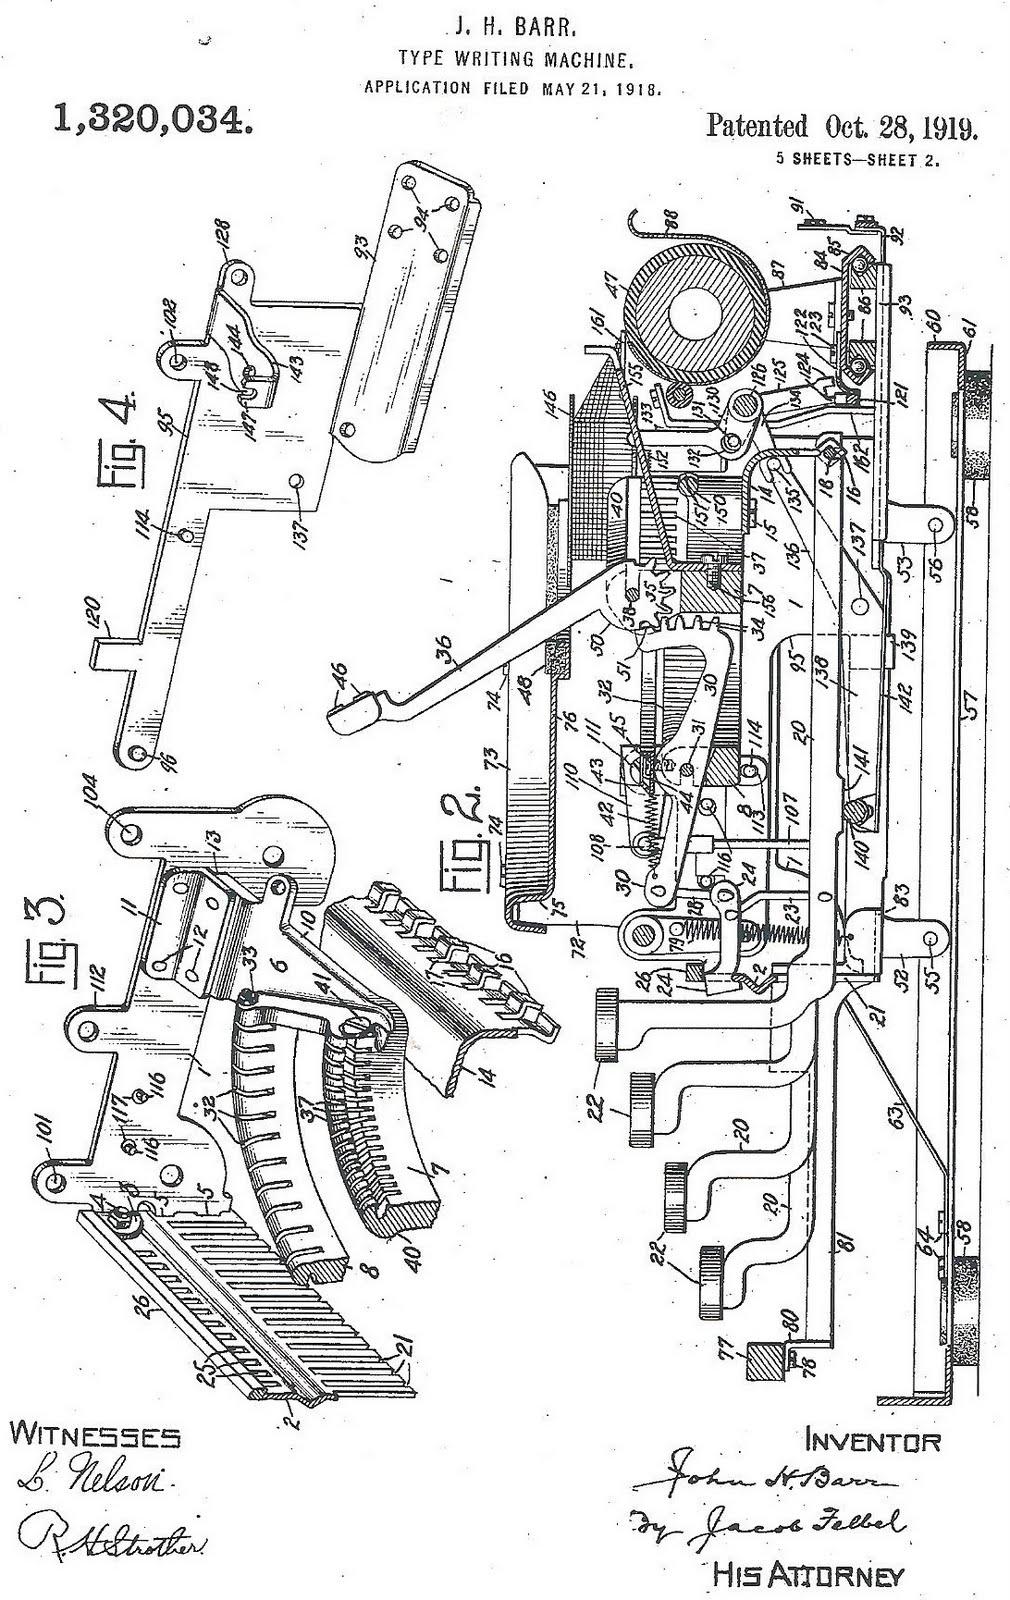 oz.Typewriter: John H.Barr and the Remington 1 Portable